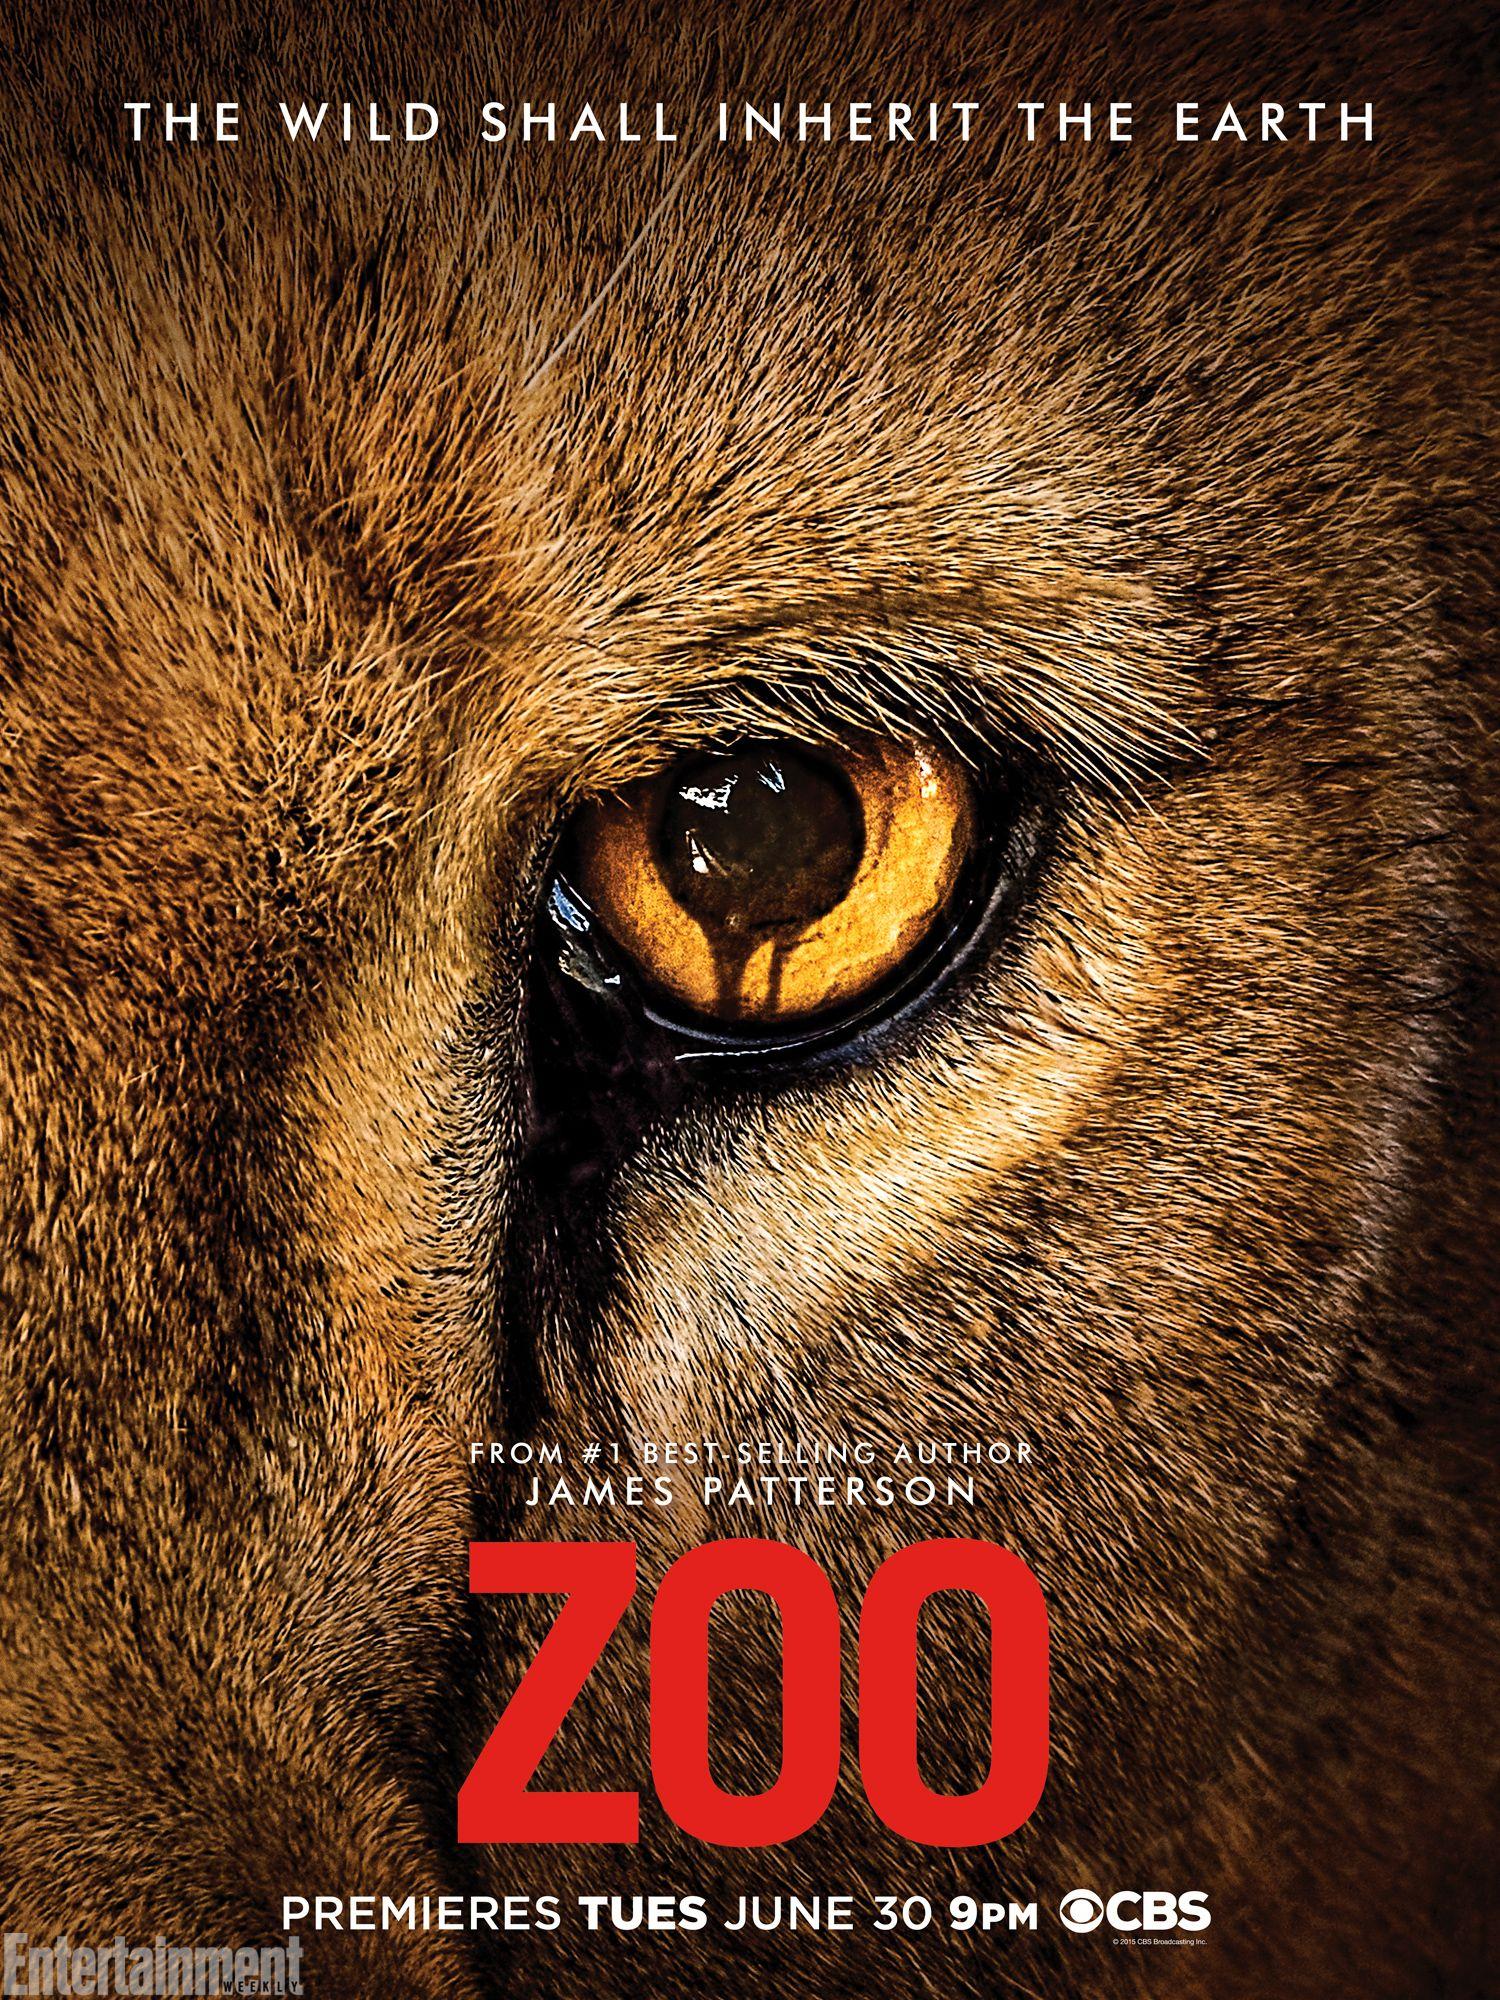 Zoo (TV Series 2015– ) Cd993d6a775b79adcd68a8c56e6fb988